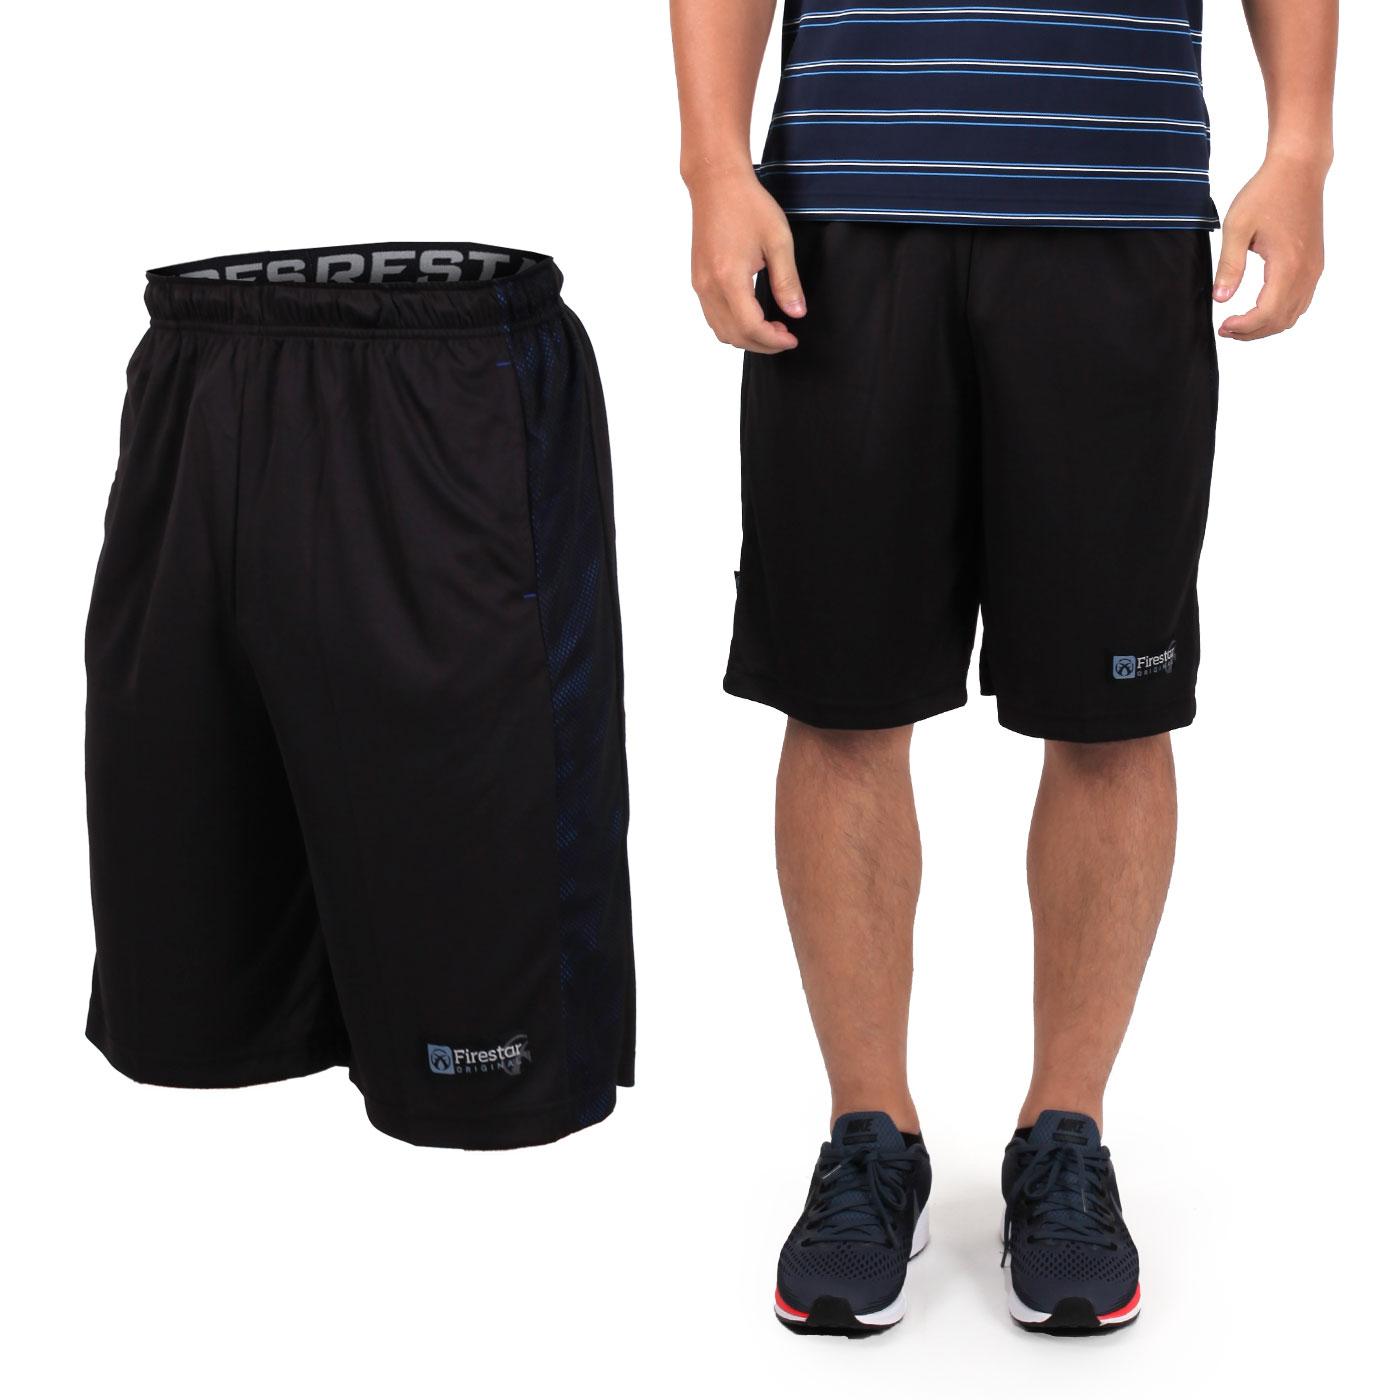 FIRESTAR 男籃球褲 B7603-40 - 黑藍